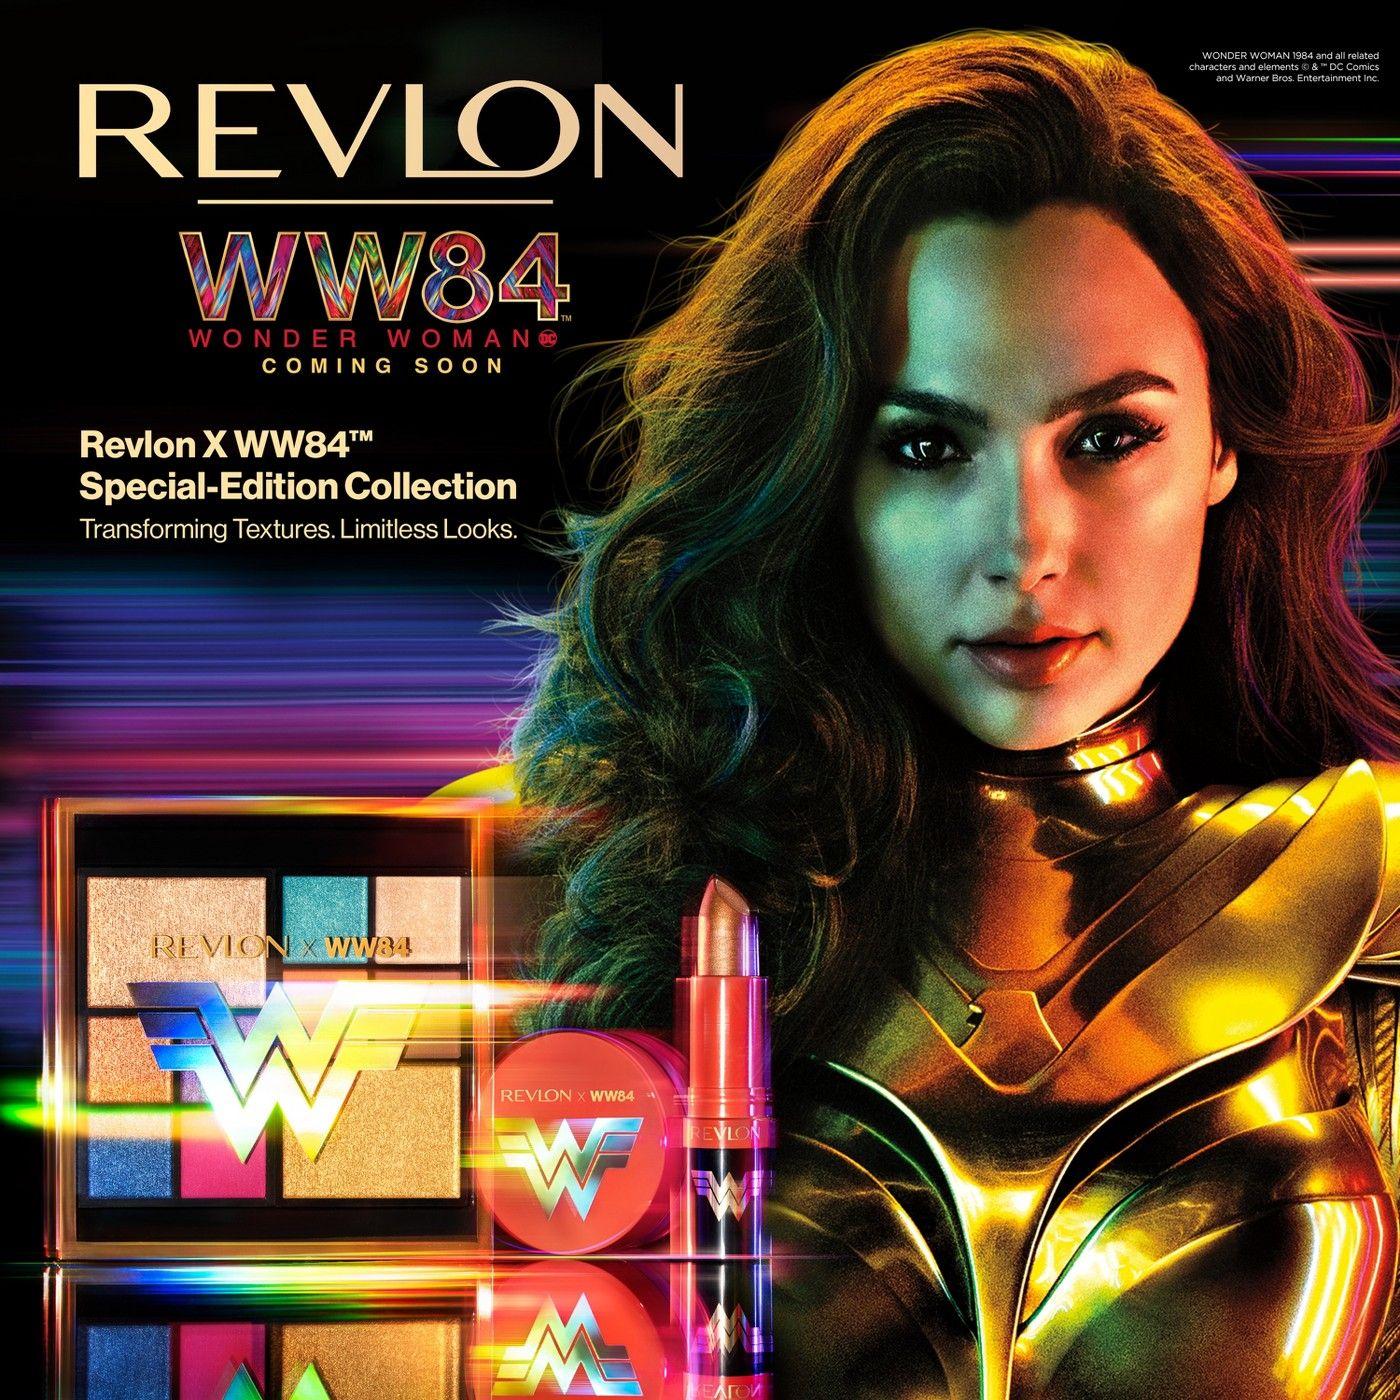 Revlon X Wonder Woman 84 Transforming Eye Powders - Turquoise/Purple - 0.028oz #Sponsored #Transforming, #ad, #Eye, #Revlon